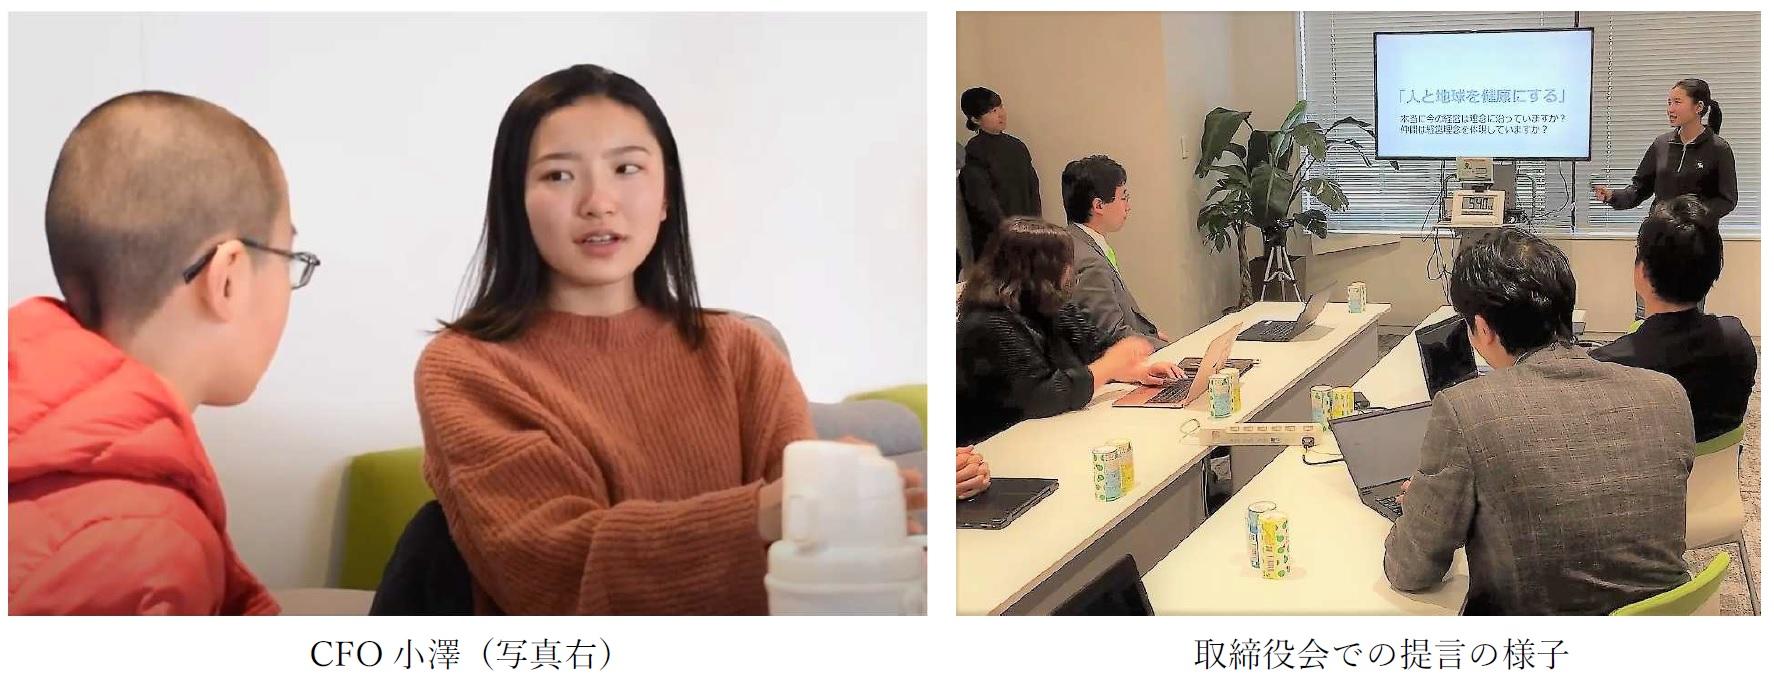 CFO小澤(写真右)&取締役会での提言の様子